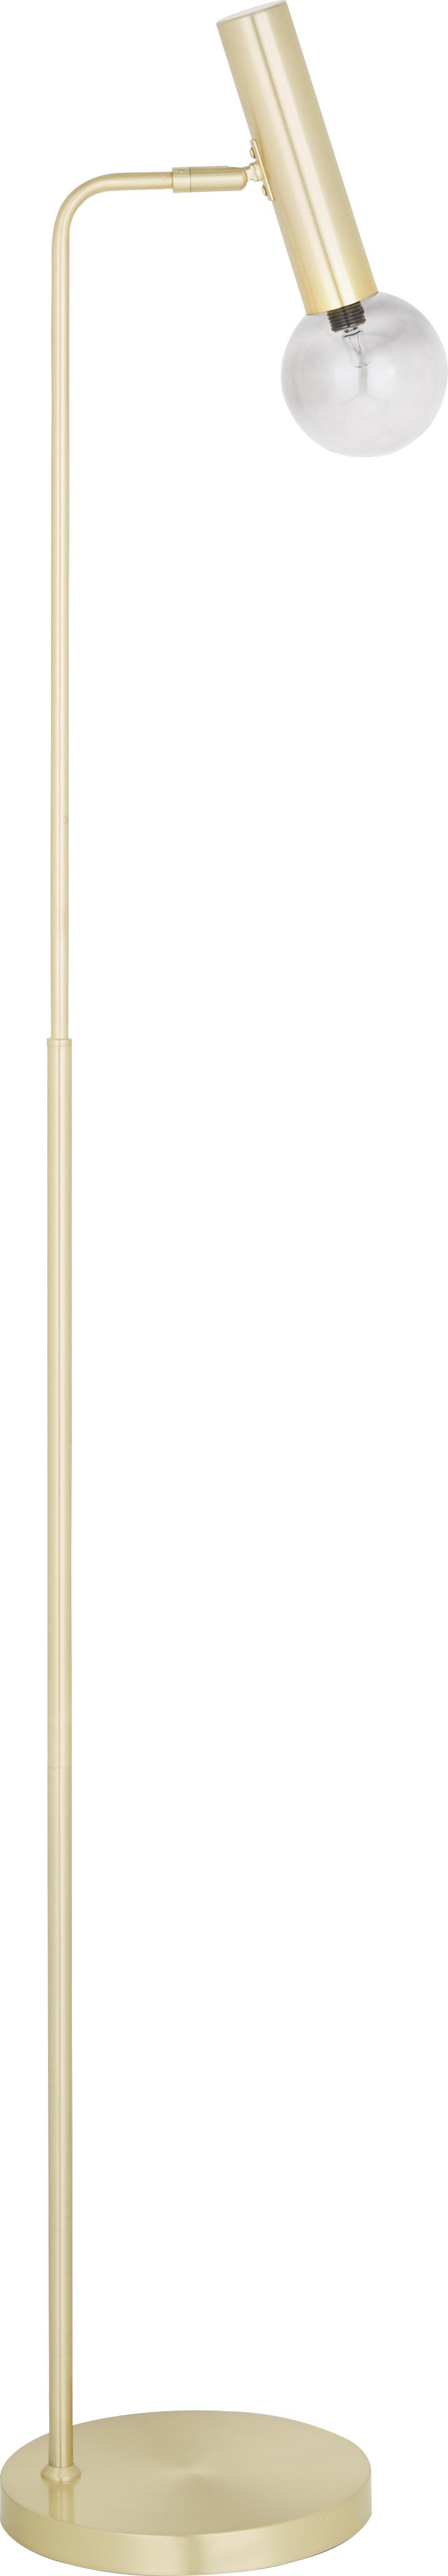 Leselampe Wilson, Lampenschirm: Glas, Messing, Ø 23 x H 153 cm